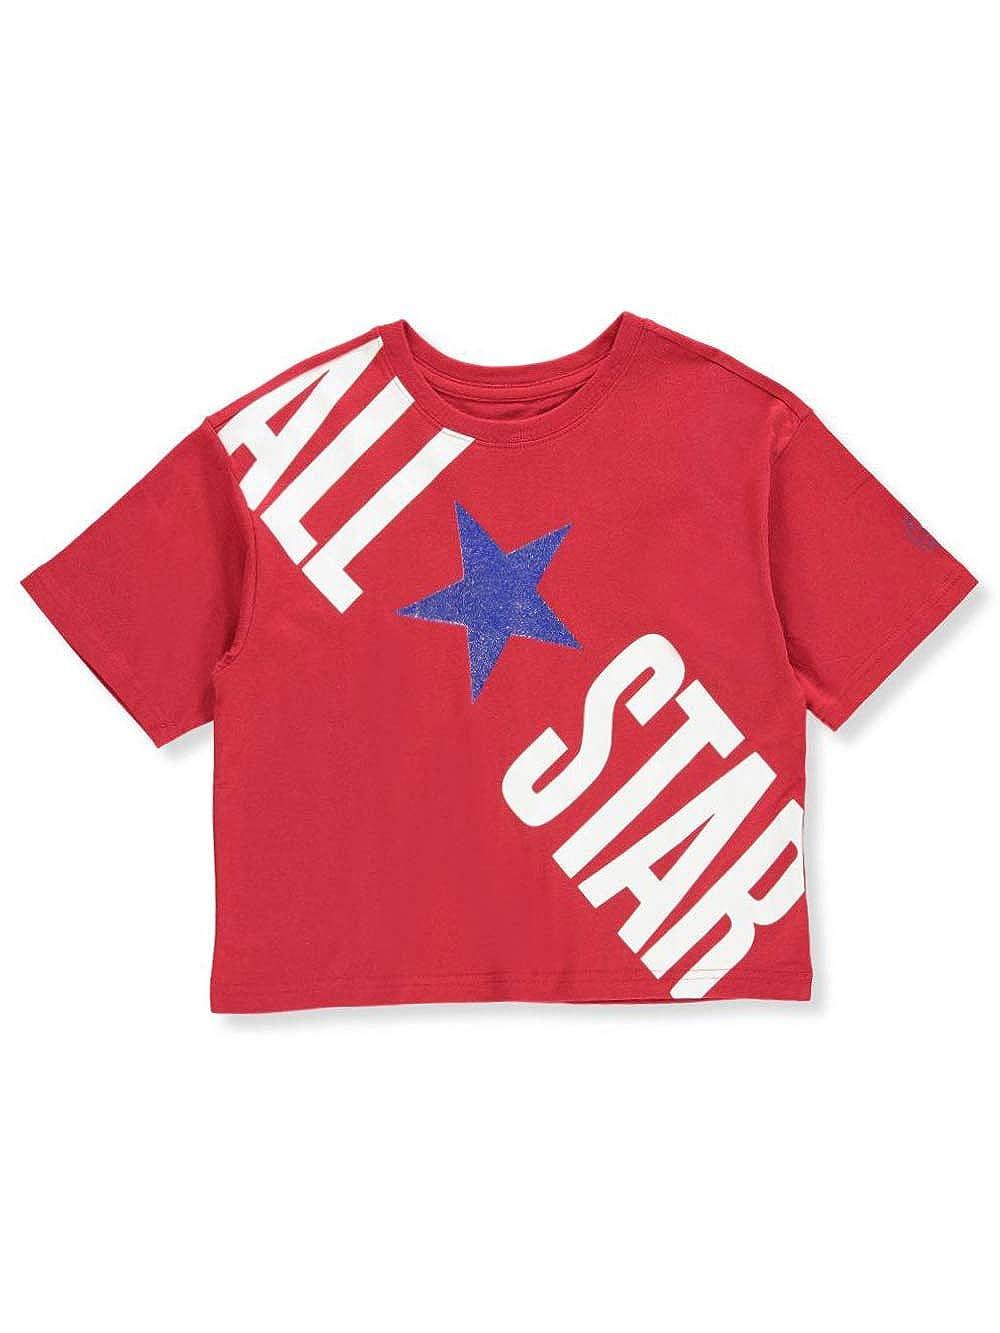 a59f7cd222f0 Amazon.com  Converse Girls  T-Shirt  Clothing